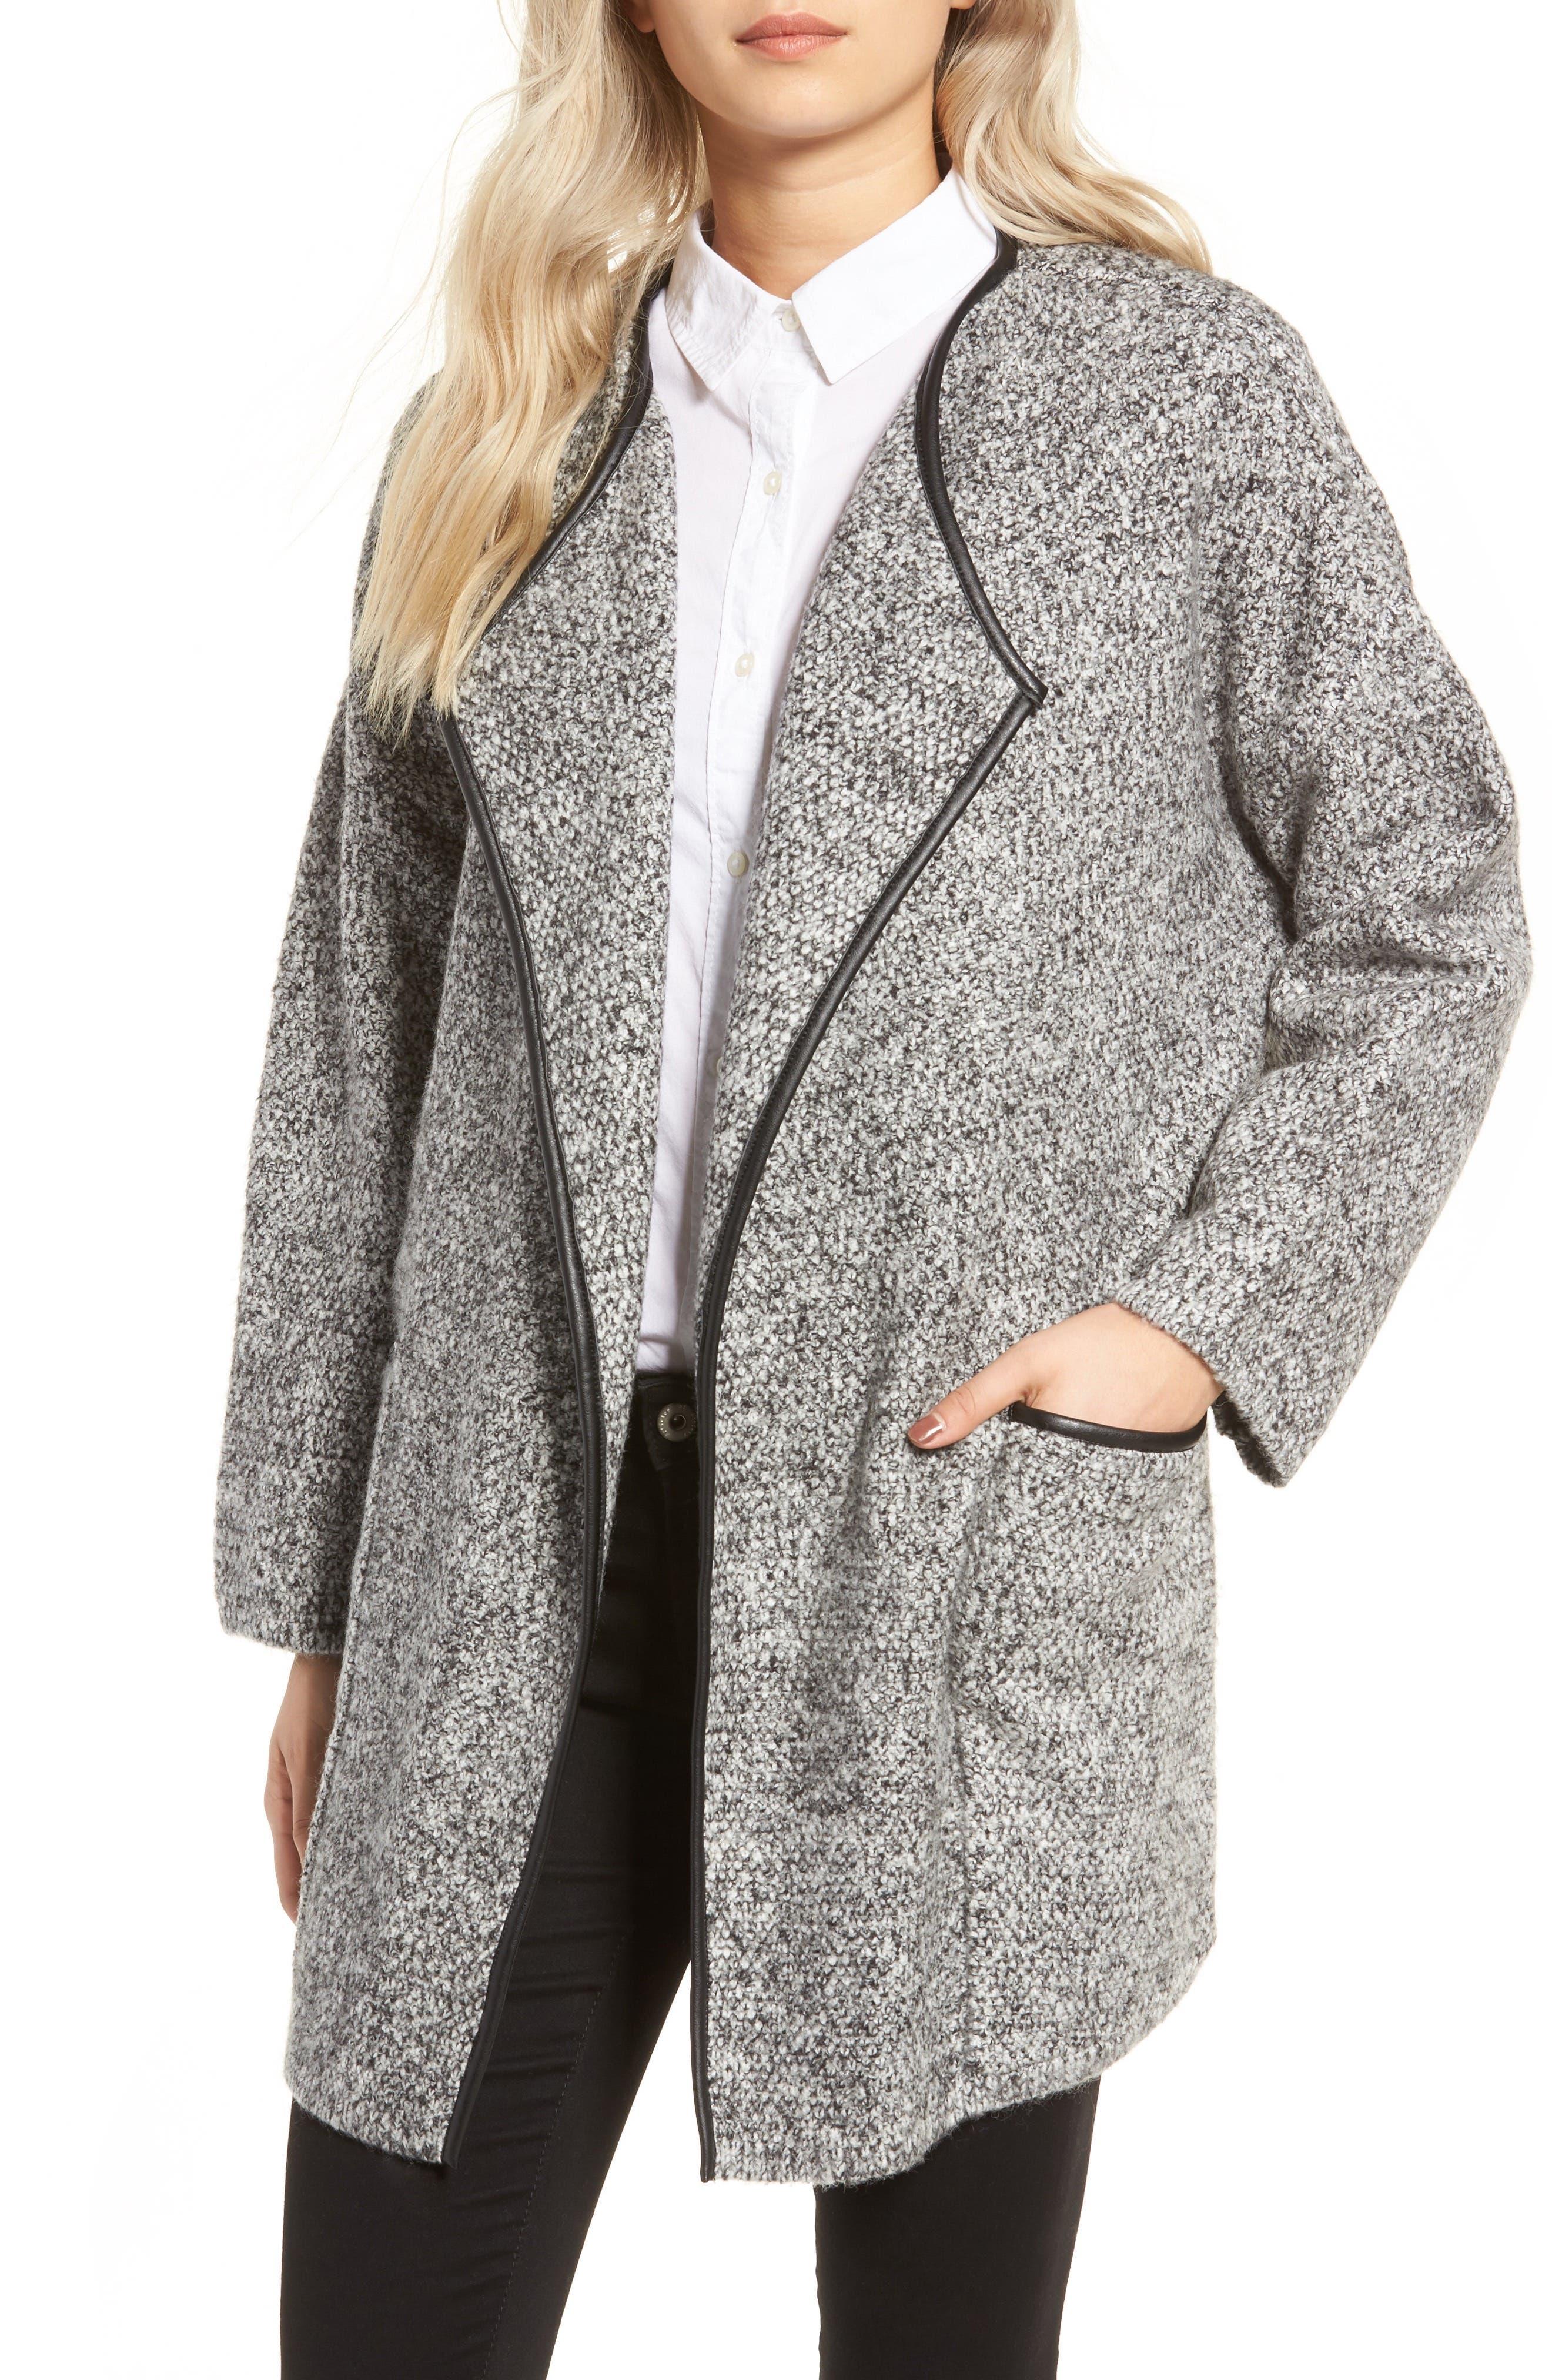 ASTR THE LABEL ASTR Drape Front Sweater Jacket, Main, color, 001